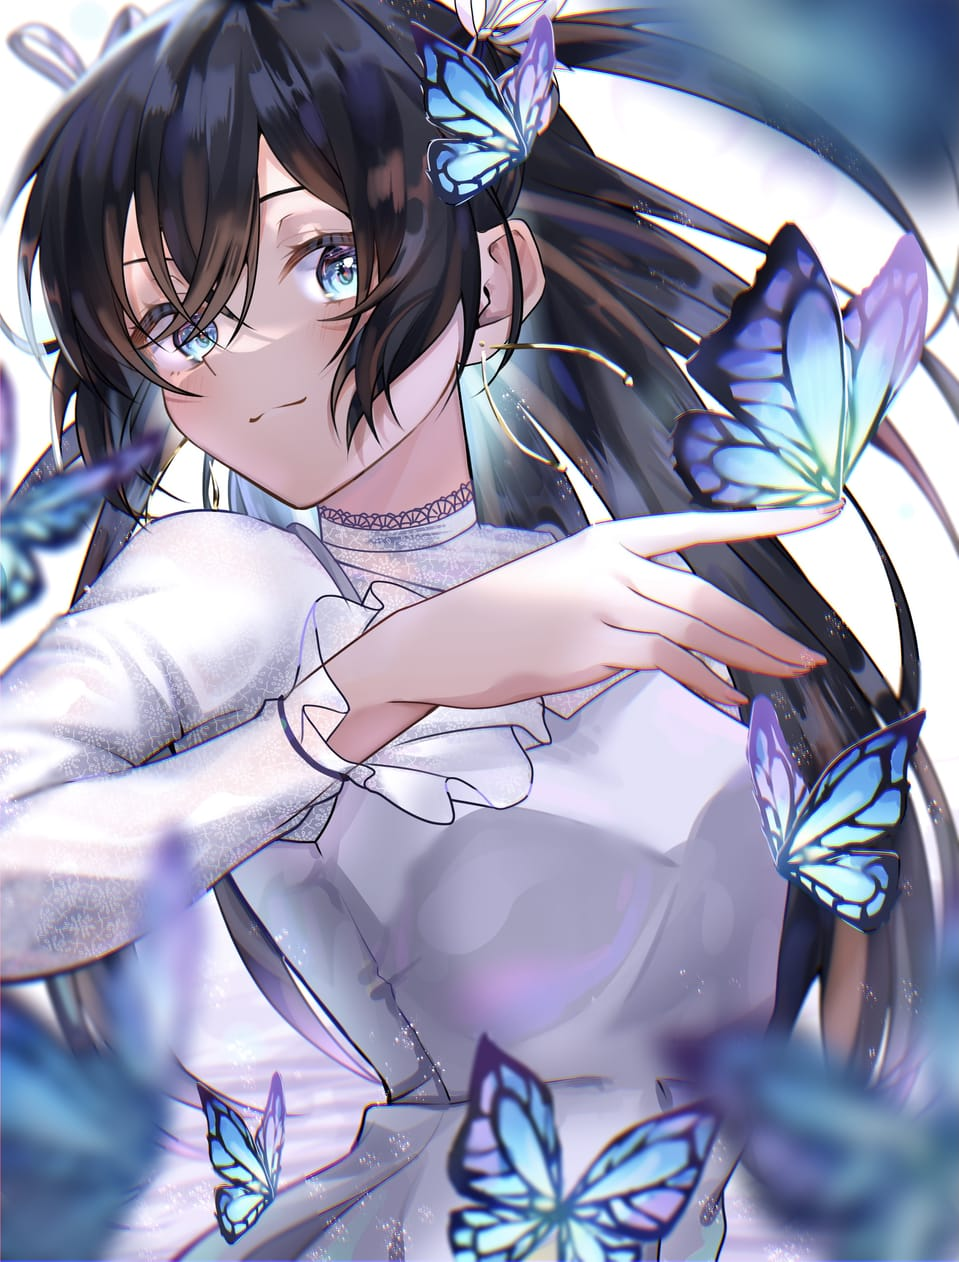 🦋 Illust of あきと 蝶々 girl oc